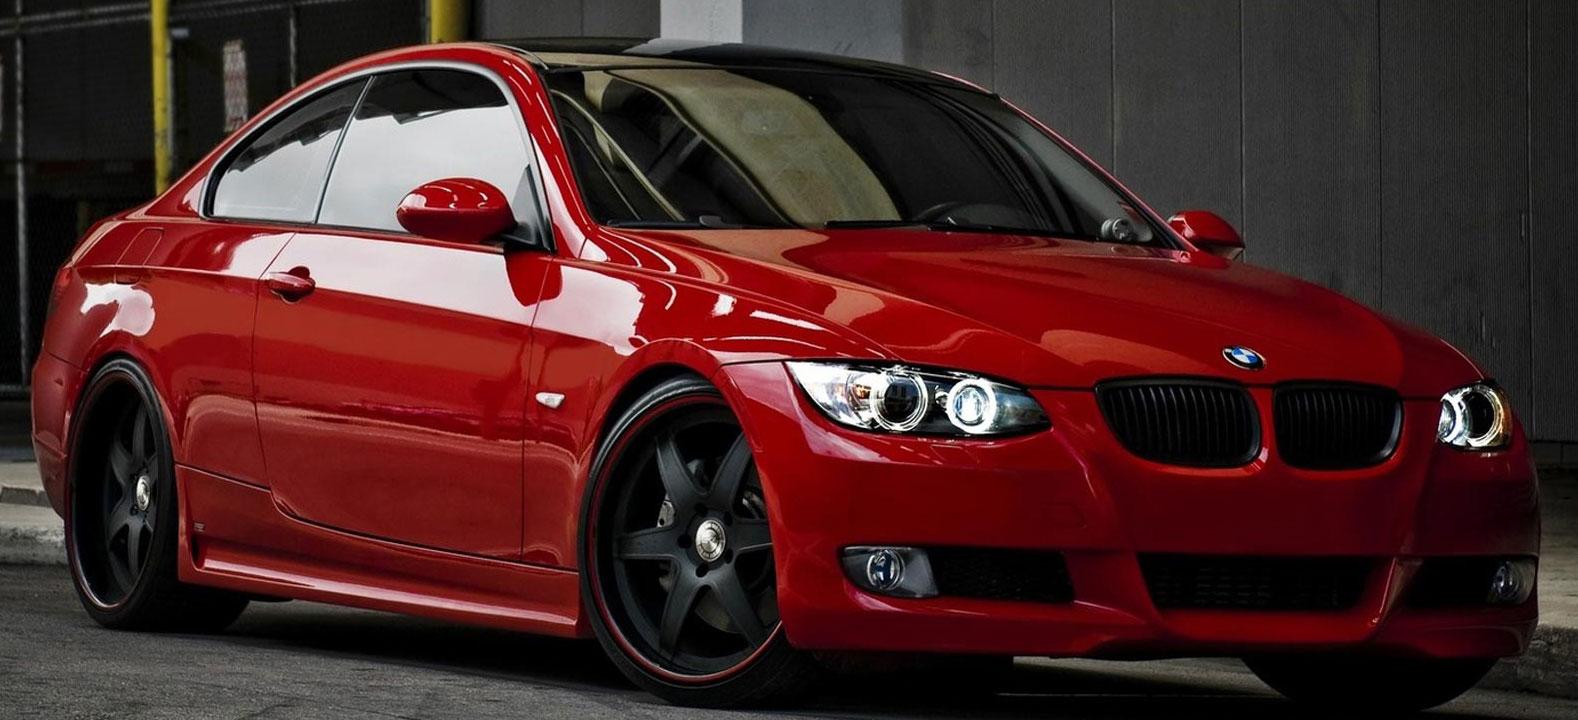 BMW Capalaba Hi-Tech Auto Repairs